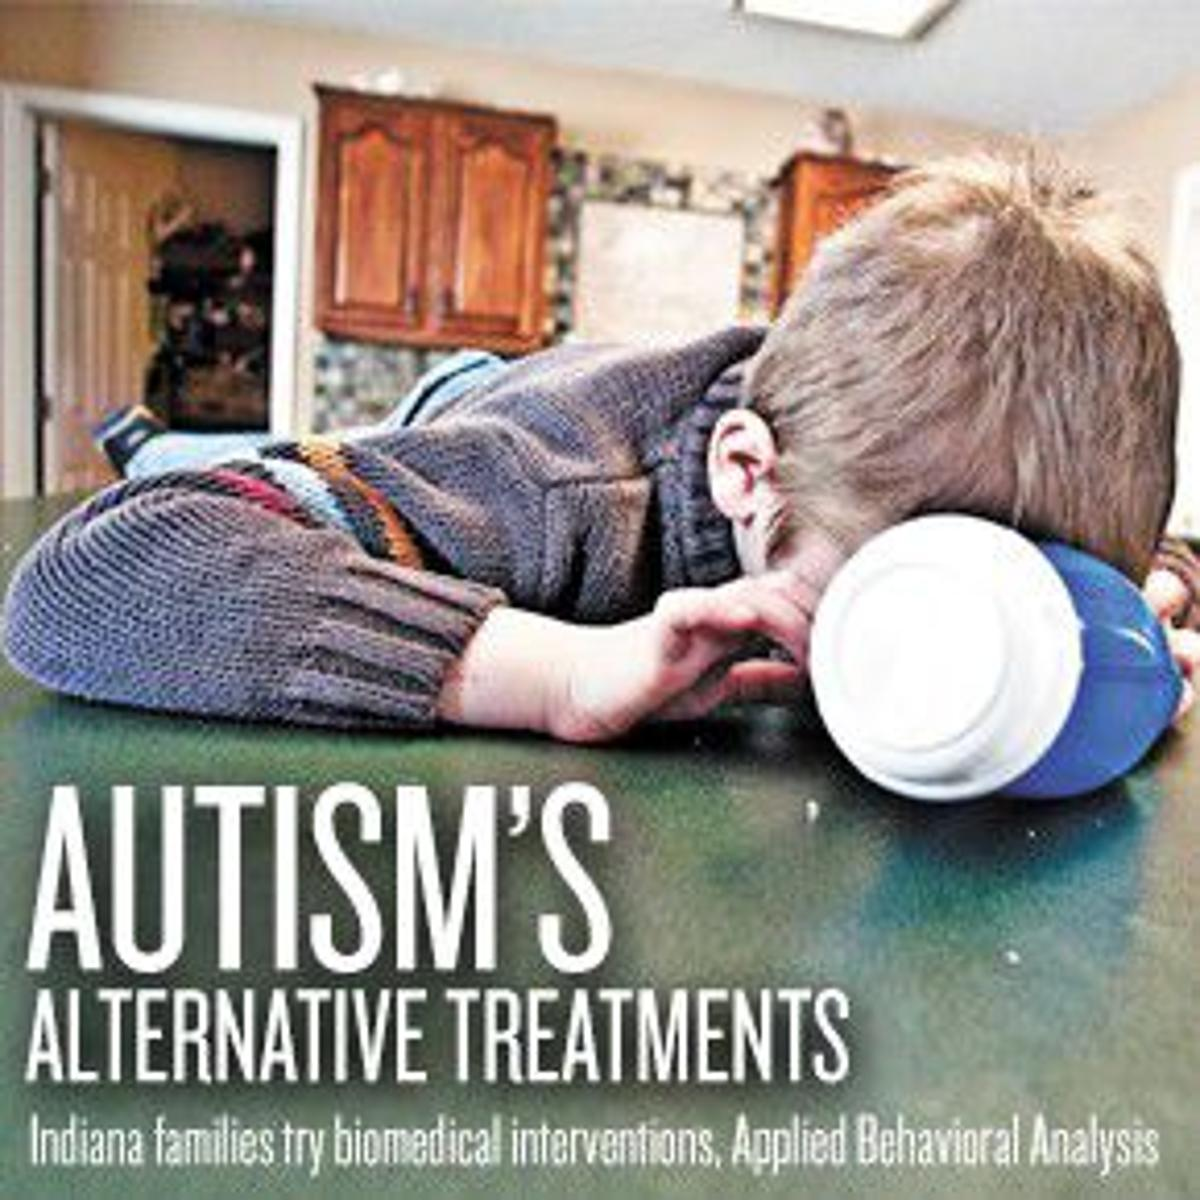 Do Alternative Treatments For Autism >> Autism And Alternative Treatments News Nuvo Net